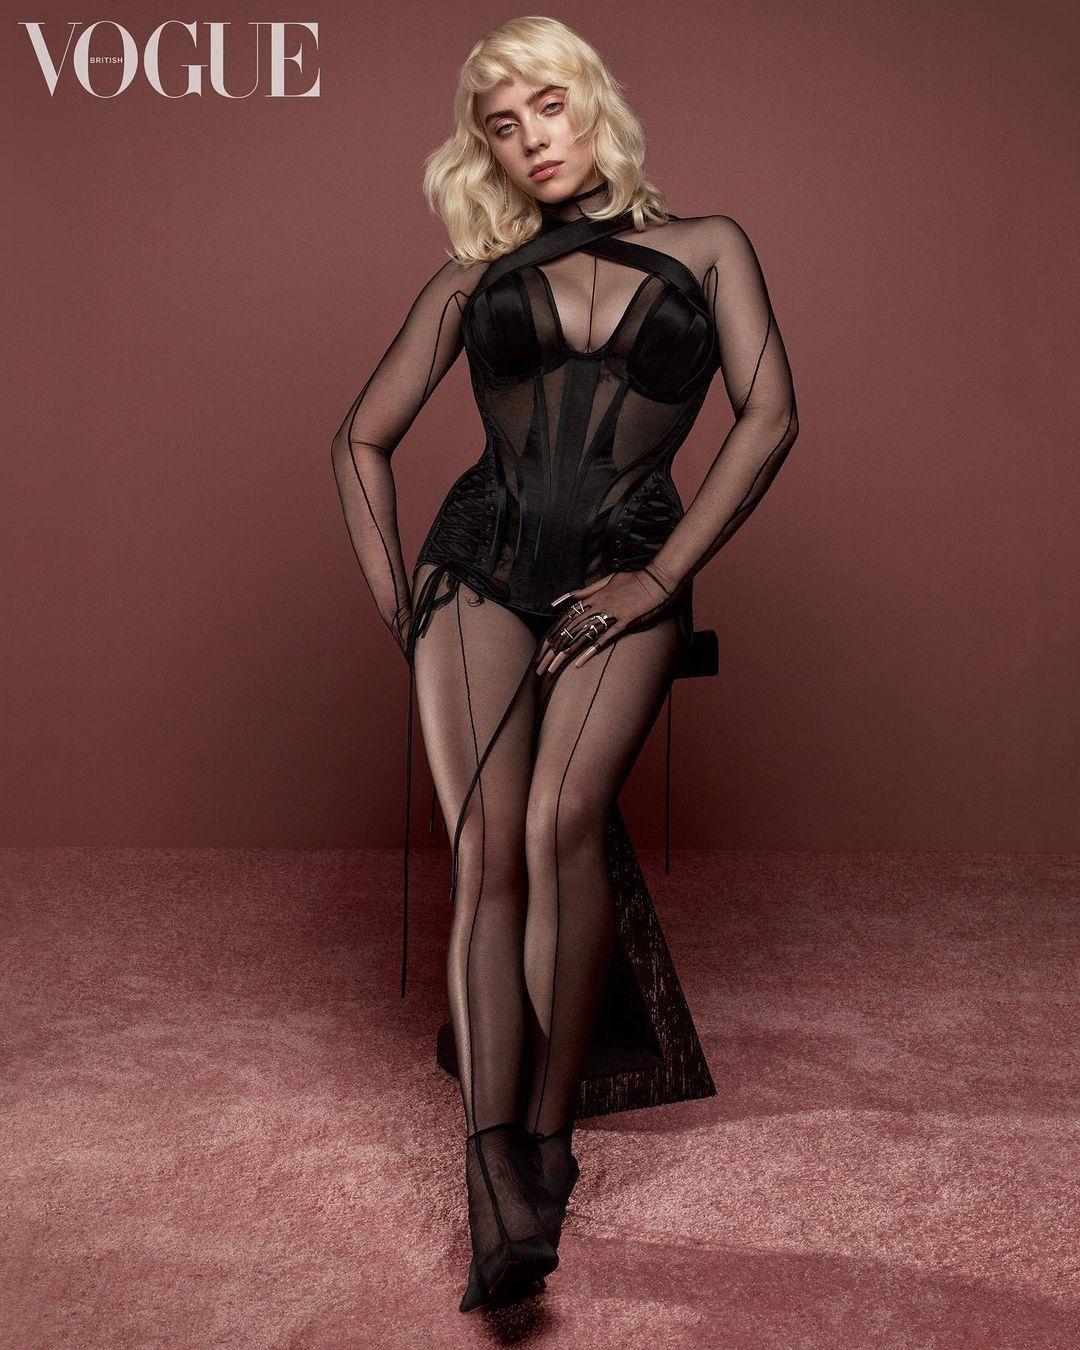 Billie Eilish Vogue Photo Shares Set Records 7